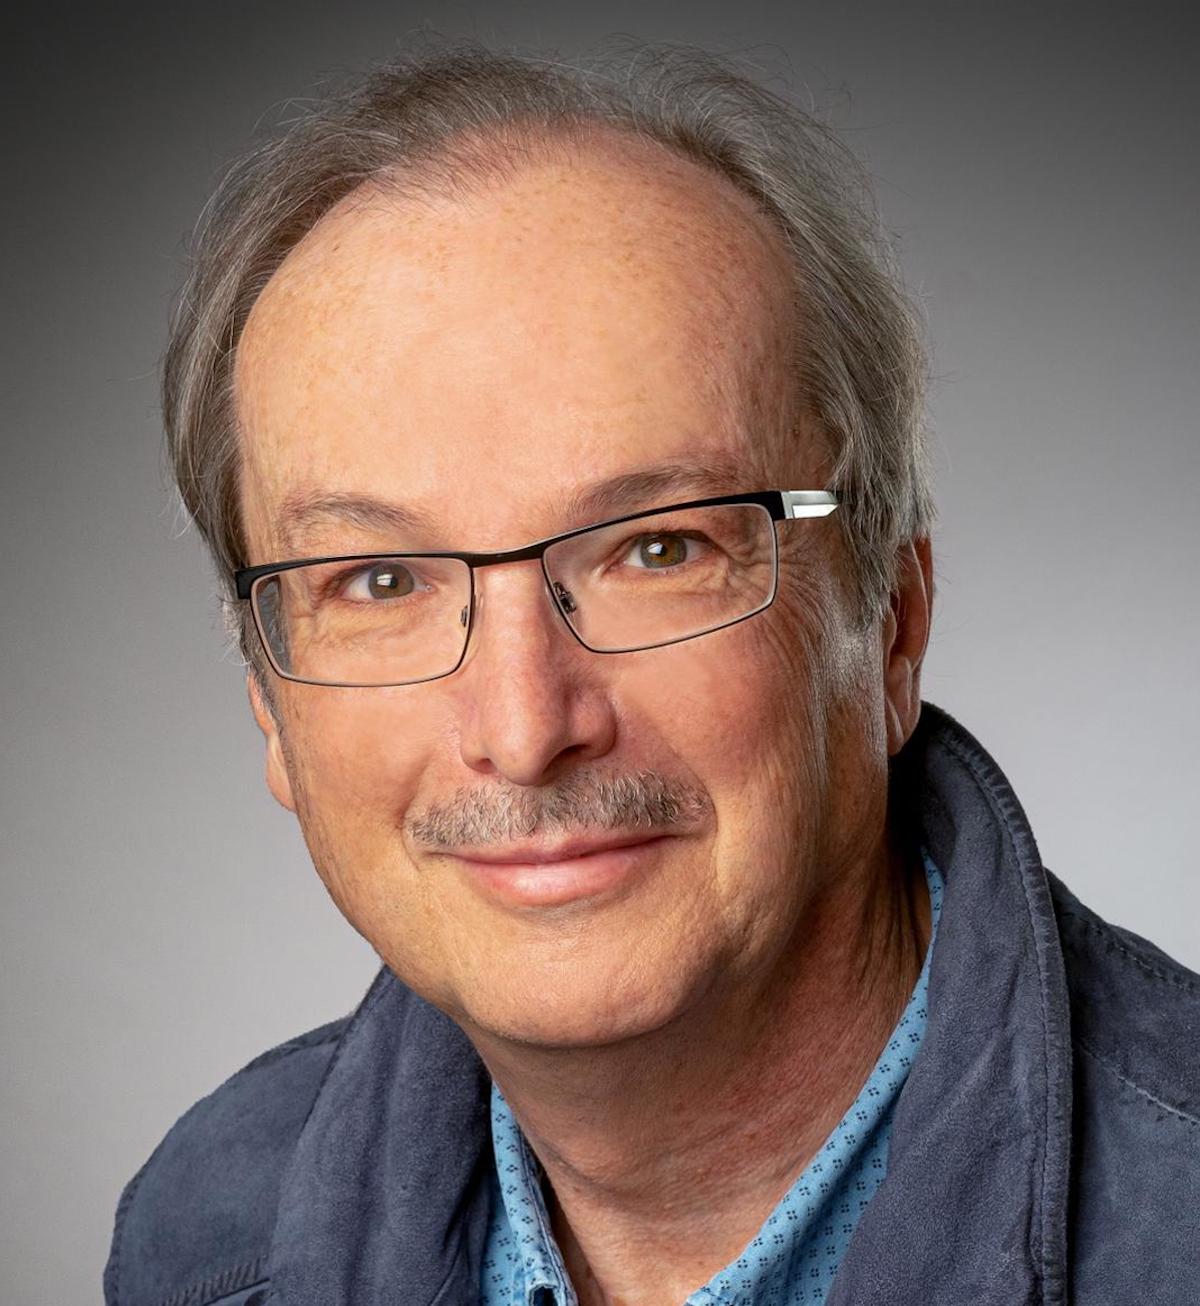 Manfred Lanz